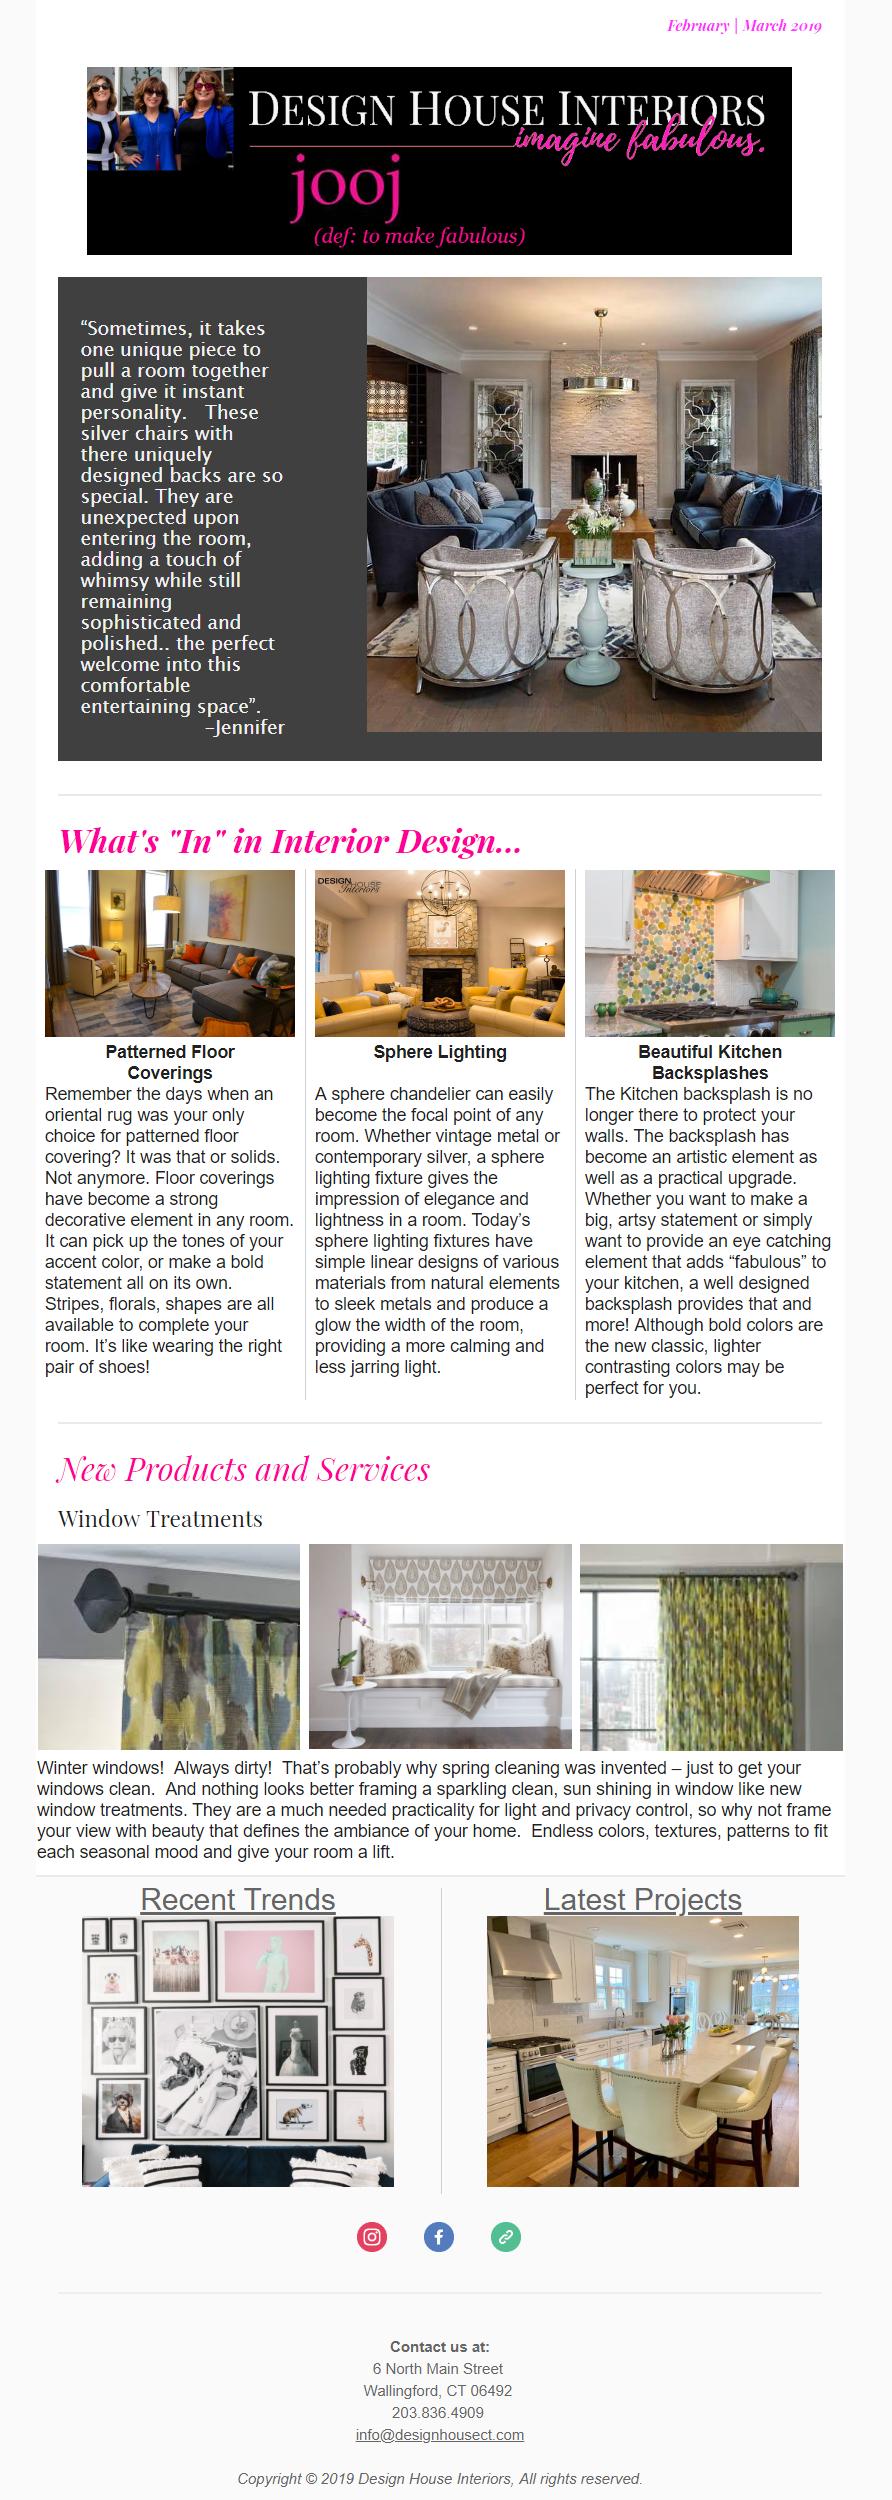 Jooj 2019 02 19 Design House Interiors Latest Projects